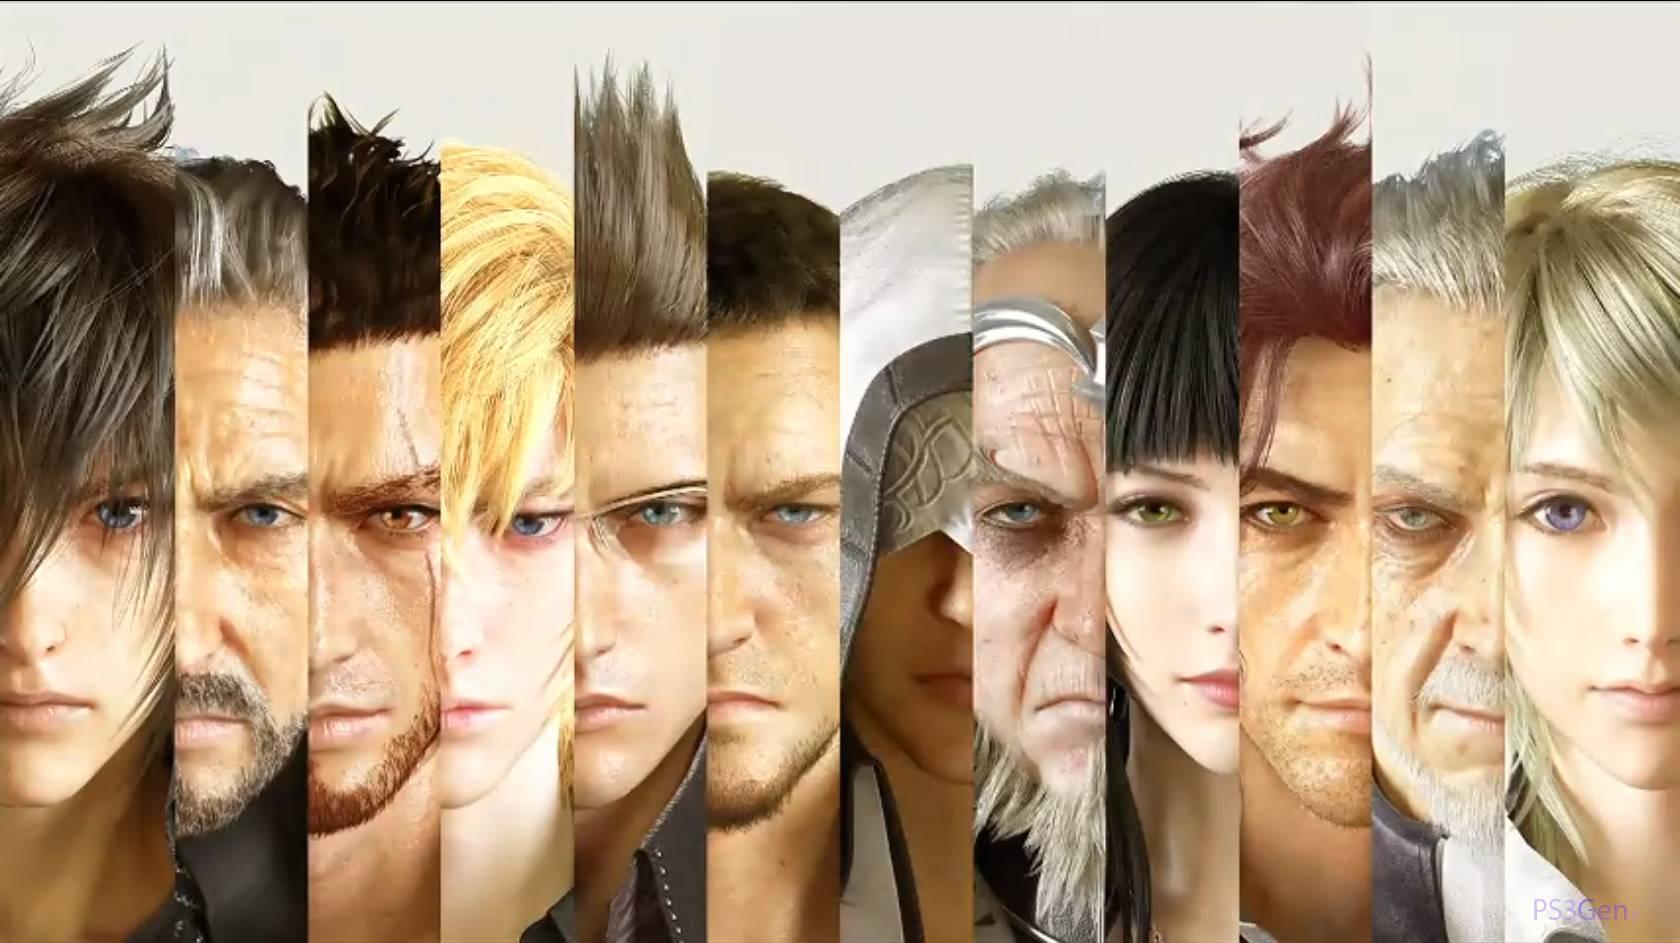 Final Fantasy XV: Worth the Wait?